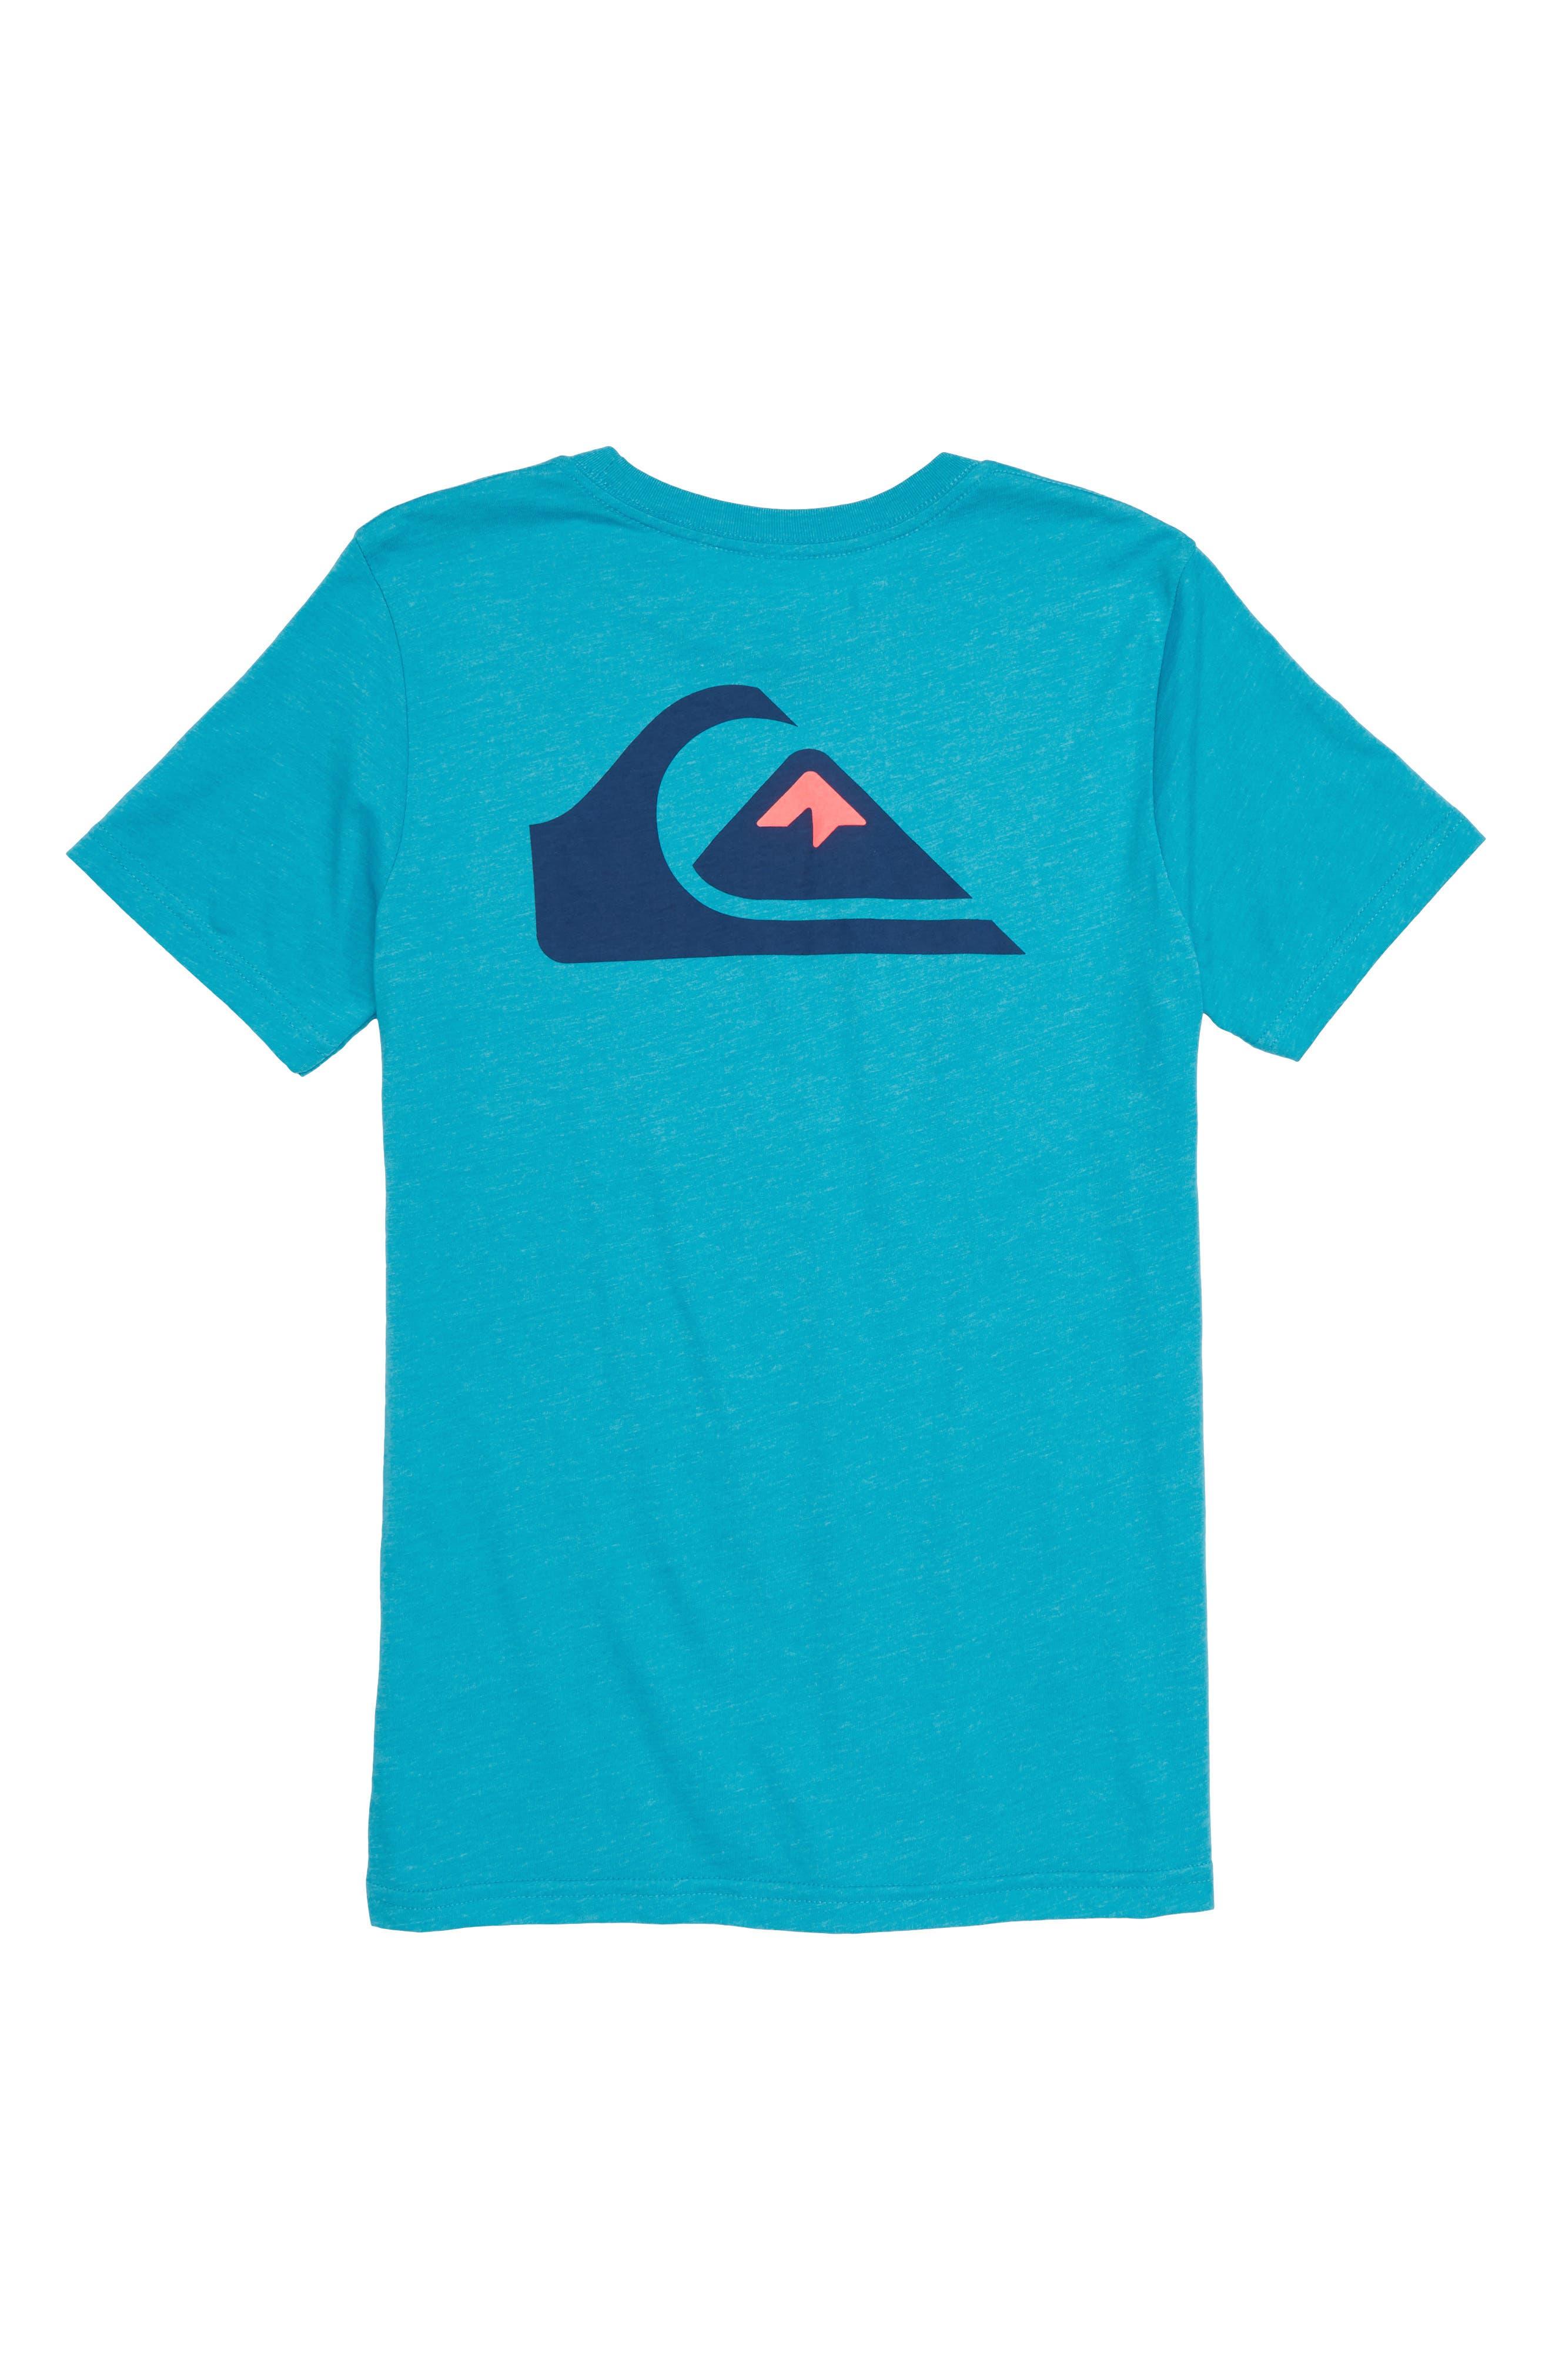 Vice Versa Graphic T-Shirt,                             Alternate thumbnail 2, color,                             437